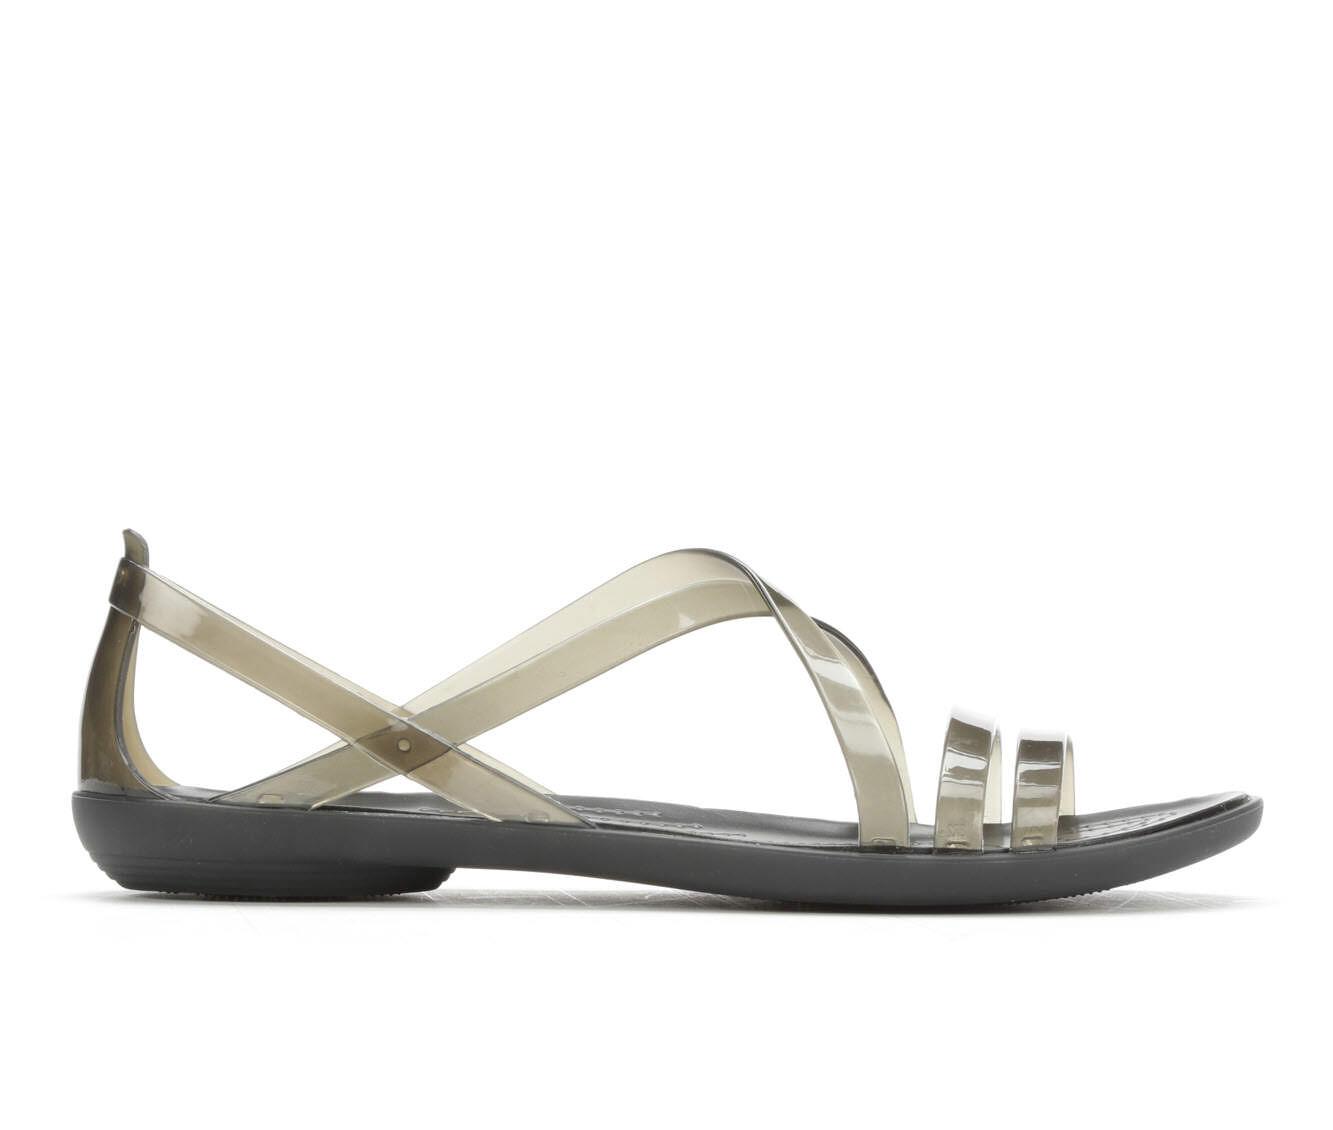 Women's Crocs Isabella Strappy Sandals Black